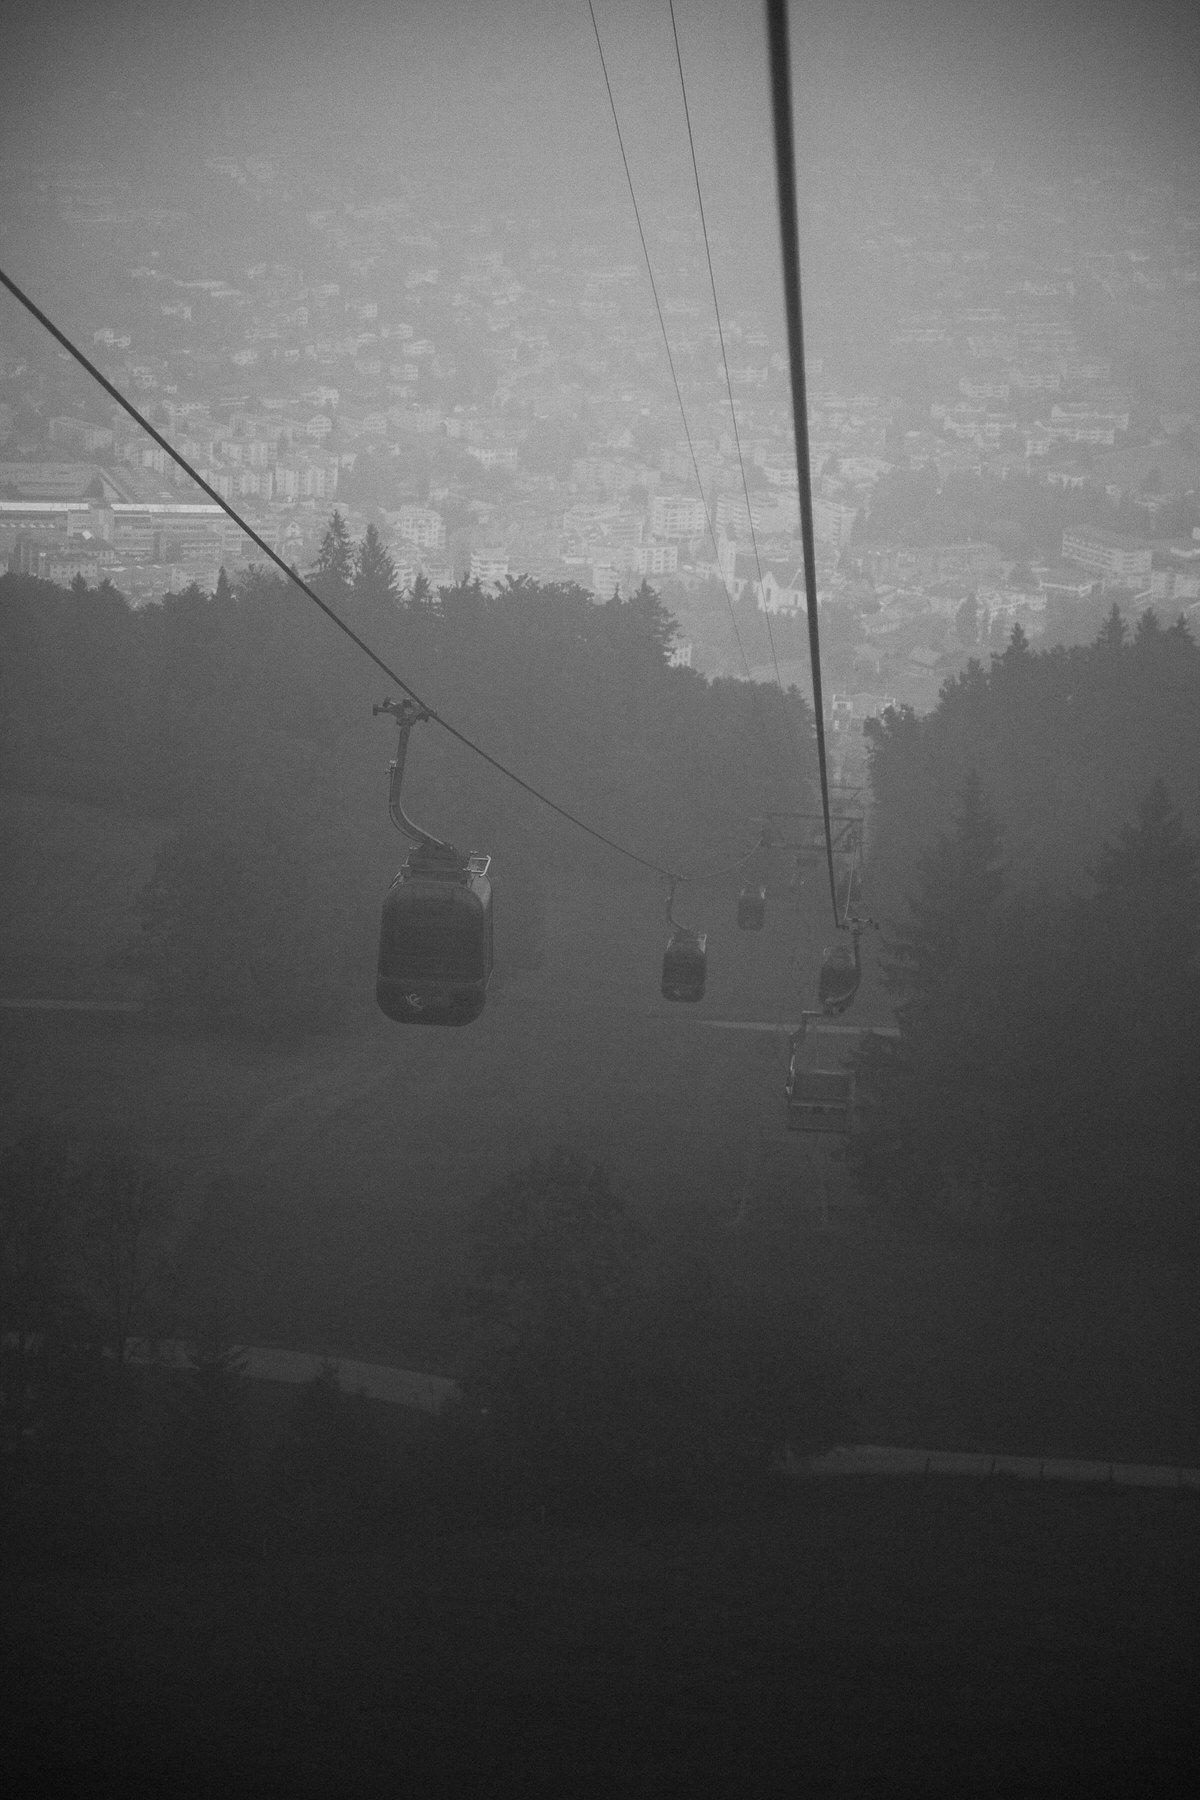 Mount_Pilatus_Lucerne_Switzerland-black-and-white-fine-art-photography-by-Studio-L-photographer-Laura-Schneider-_4419